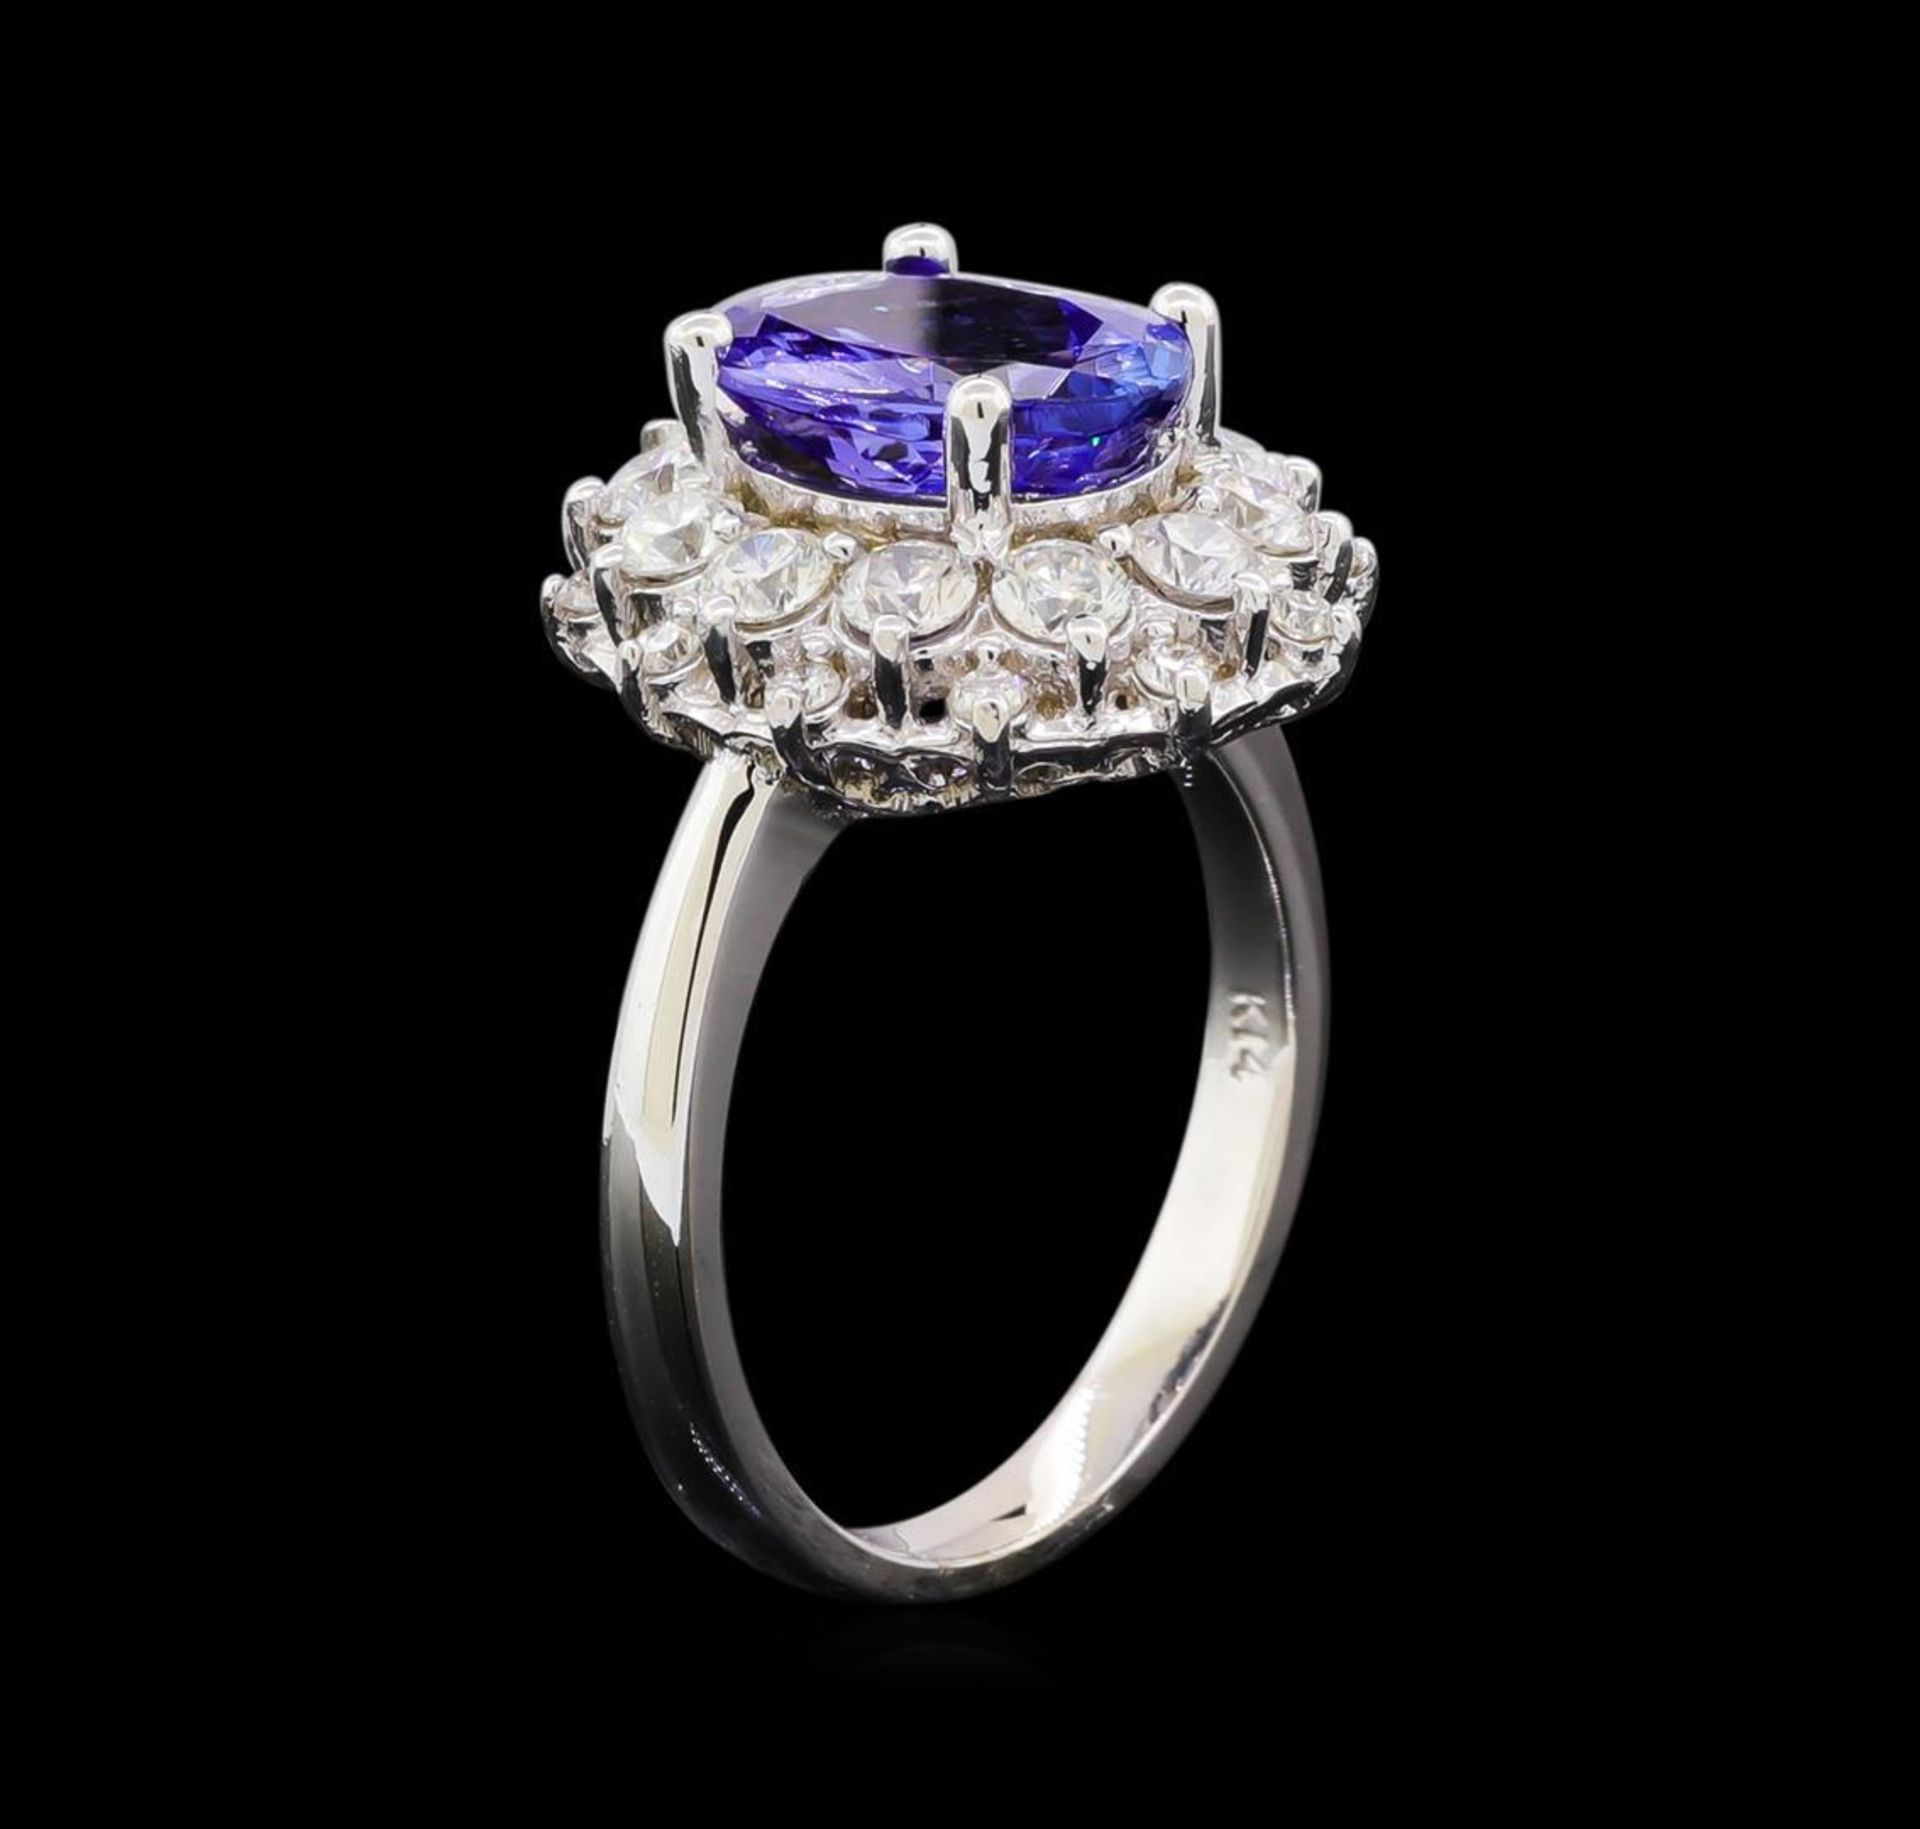 3.23 ctw Tanzanite and Diamond Ring - 14KT White Gold - Image 4 of 5